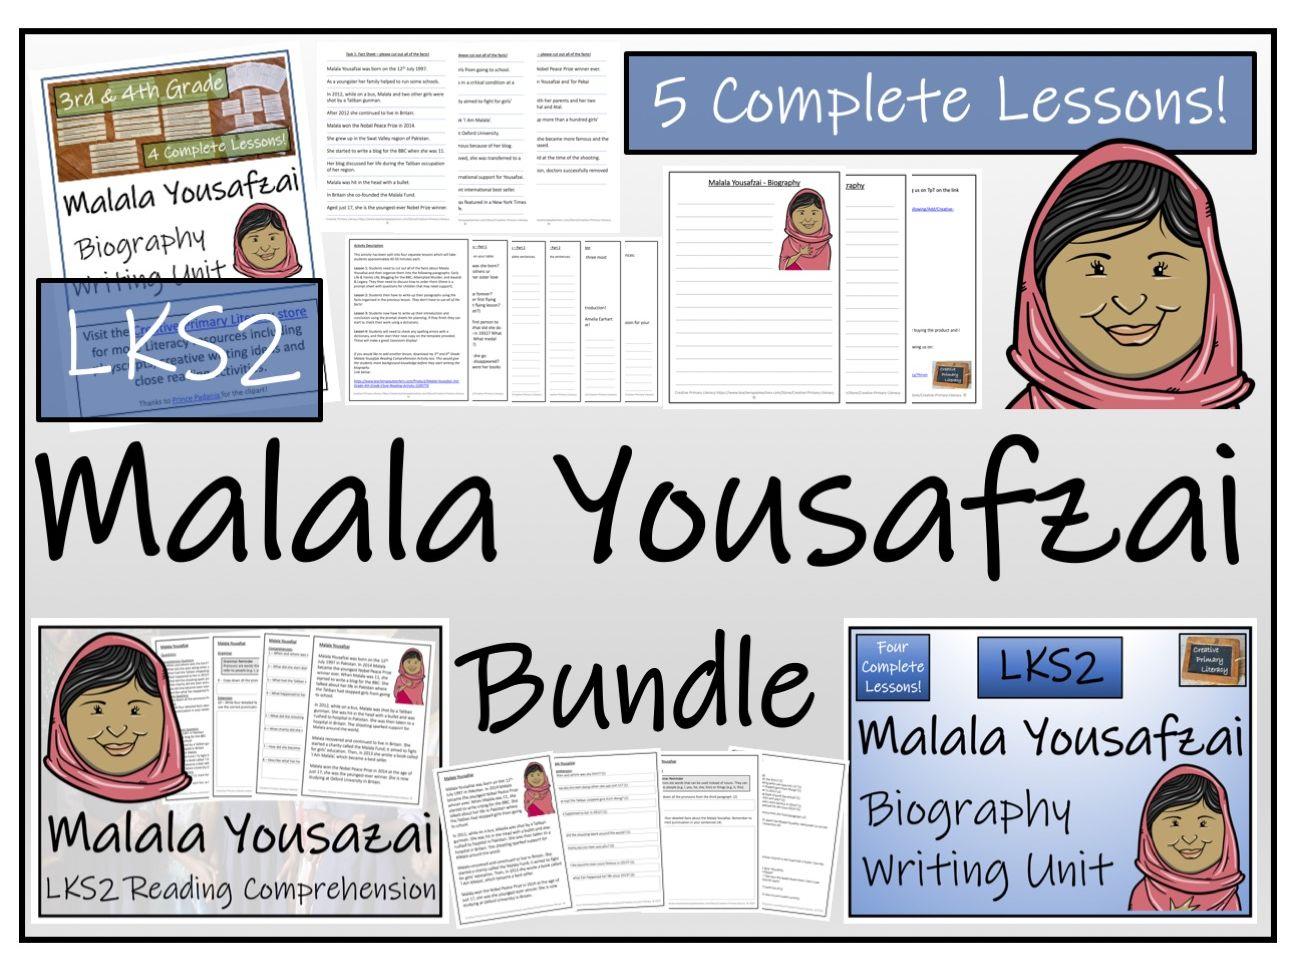 LKS2 - Malala Yousafzai Reading Comprehension & Biography Bundle